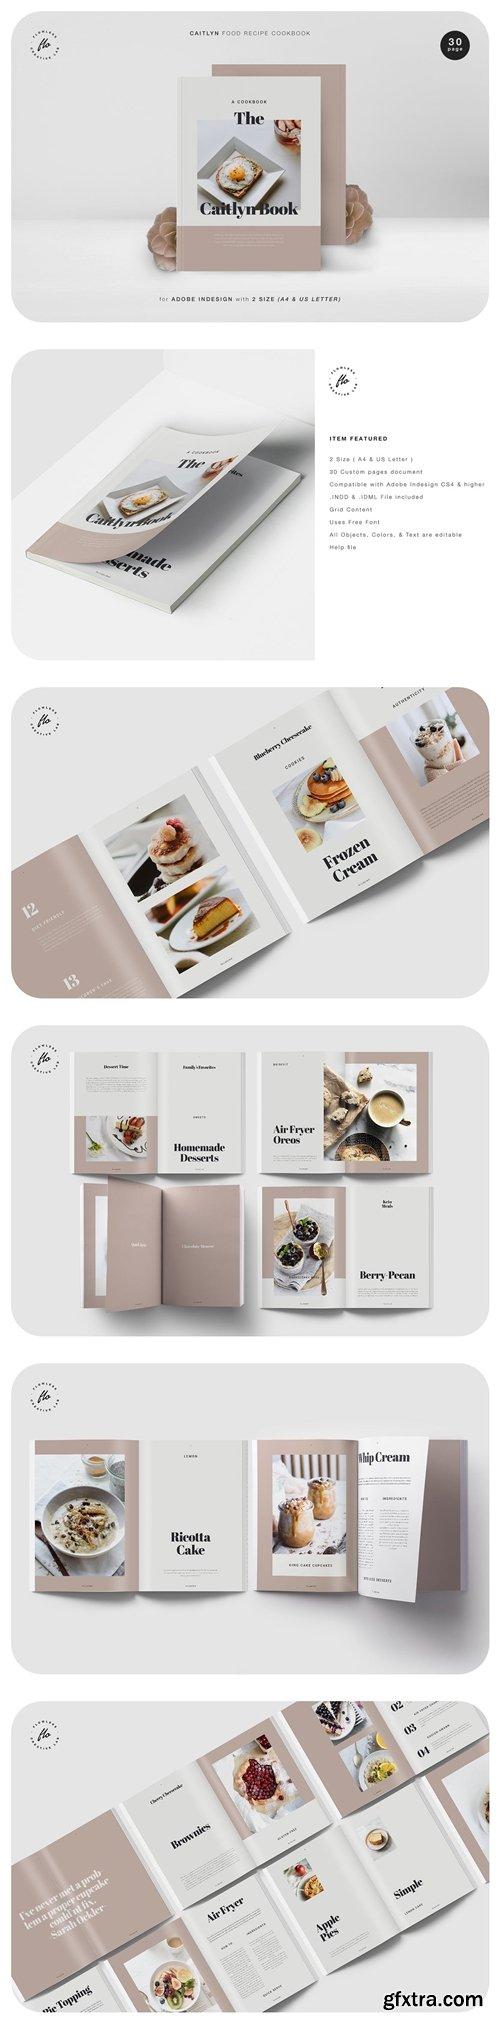 Caitlyn Food Recipe Cookbook